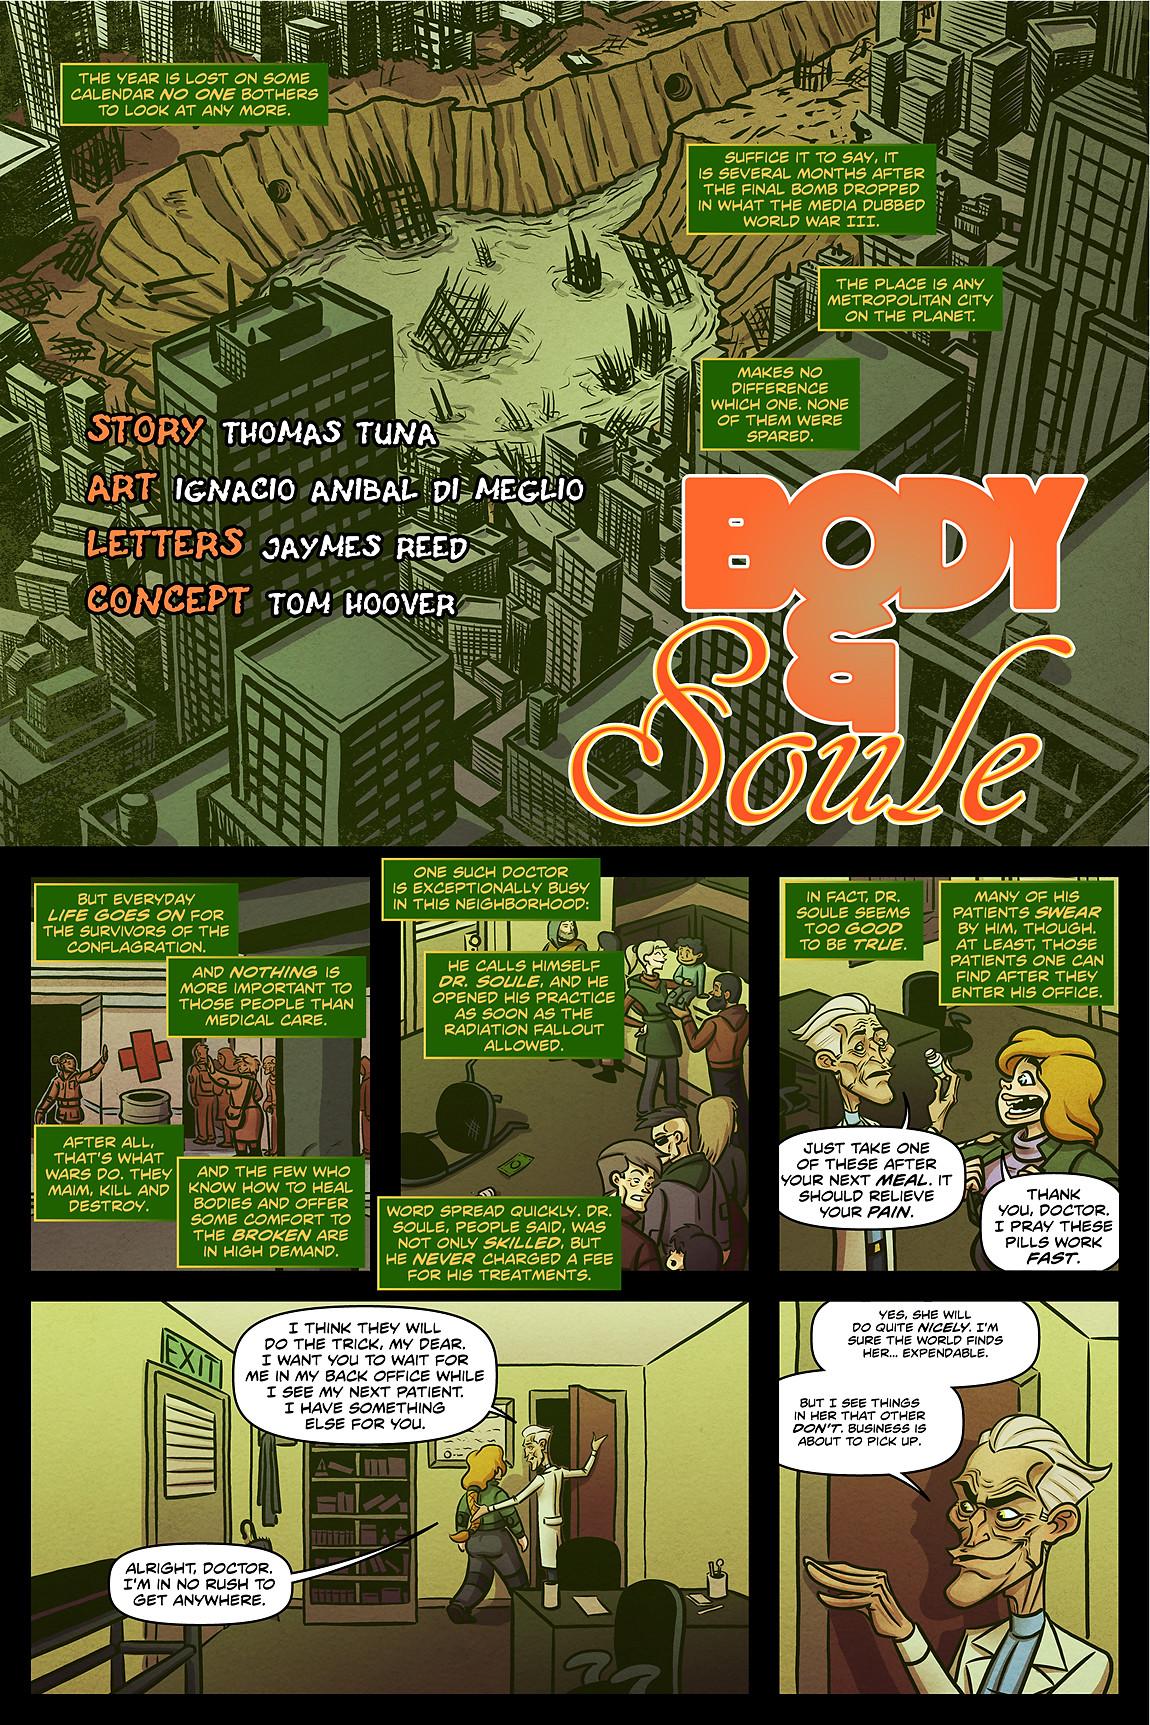 Body & Soule_Page01.jpg